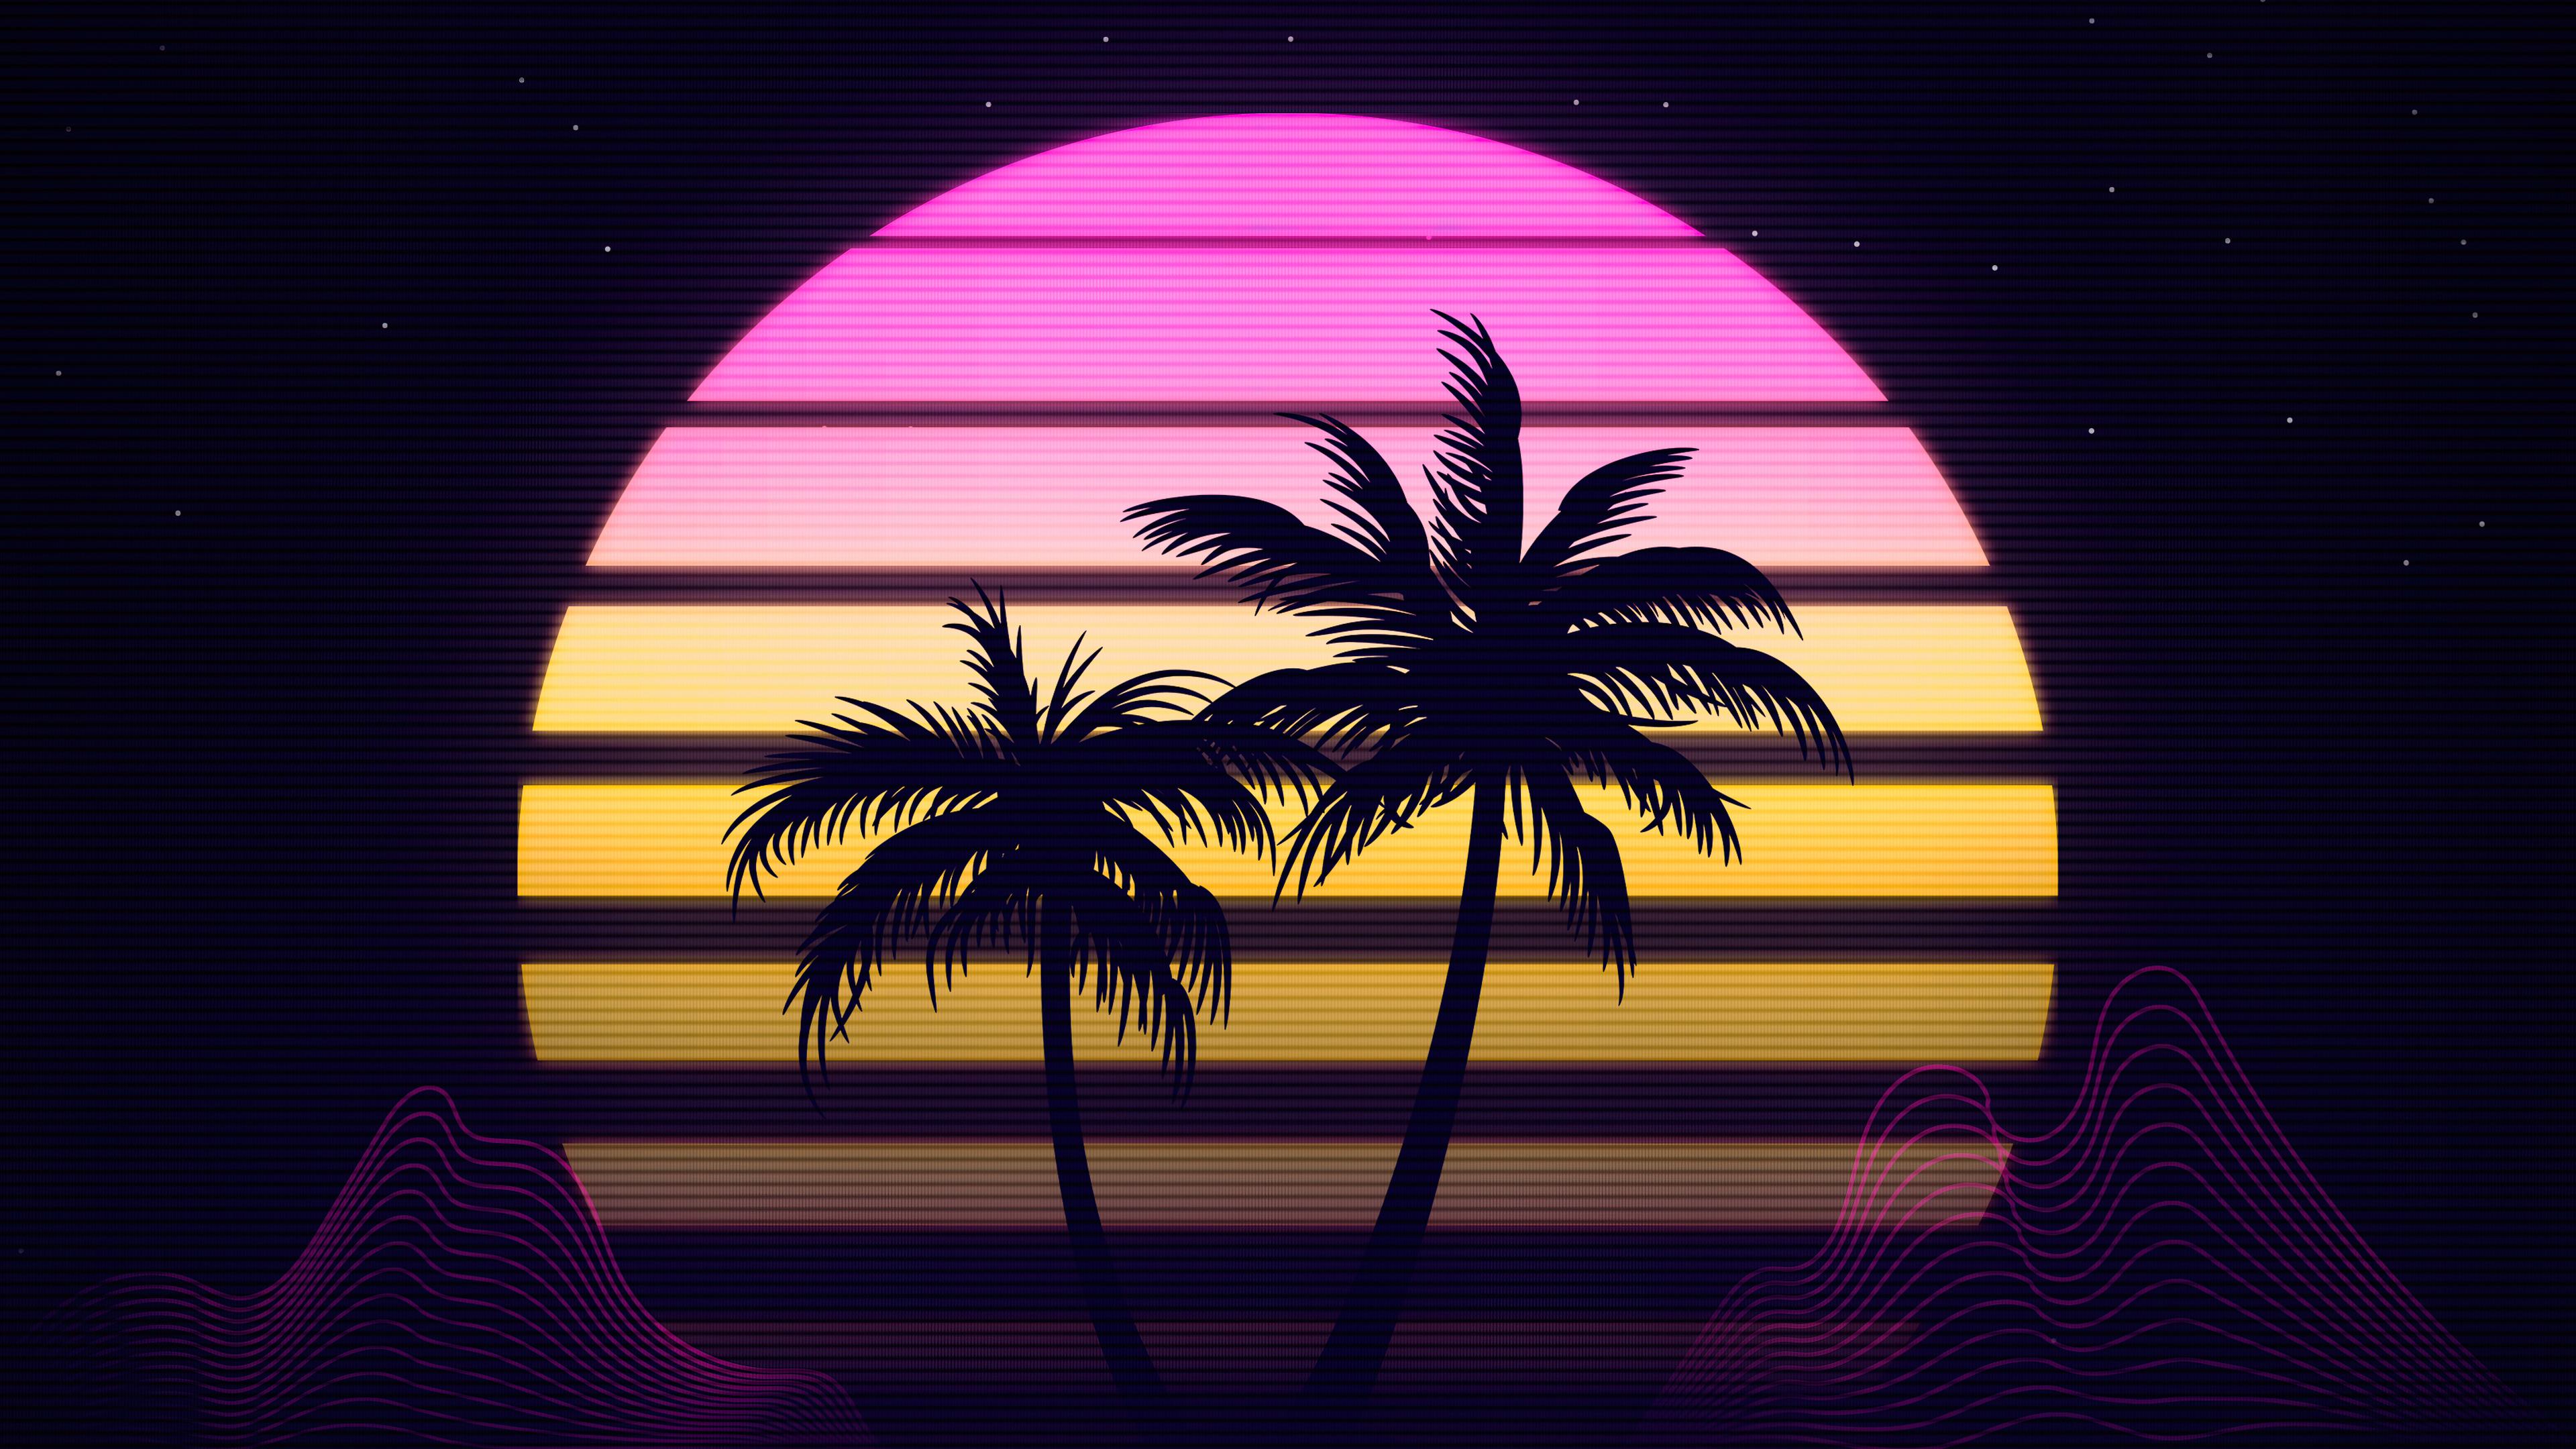 General 3840x2160 trees Retrowave 4K artwork digital art # perfection CGI render neon sky stars